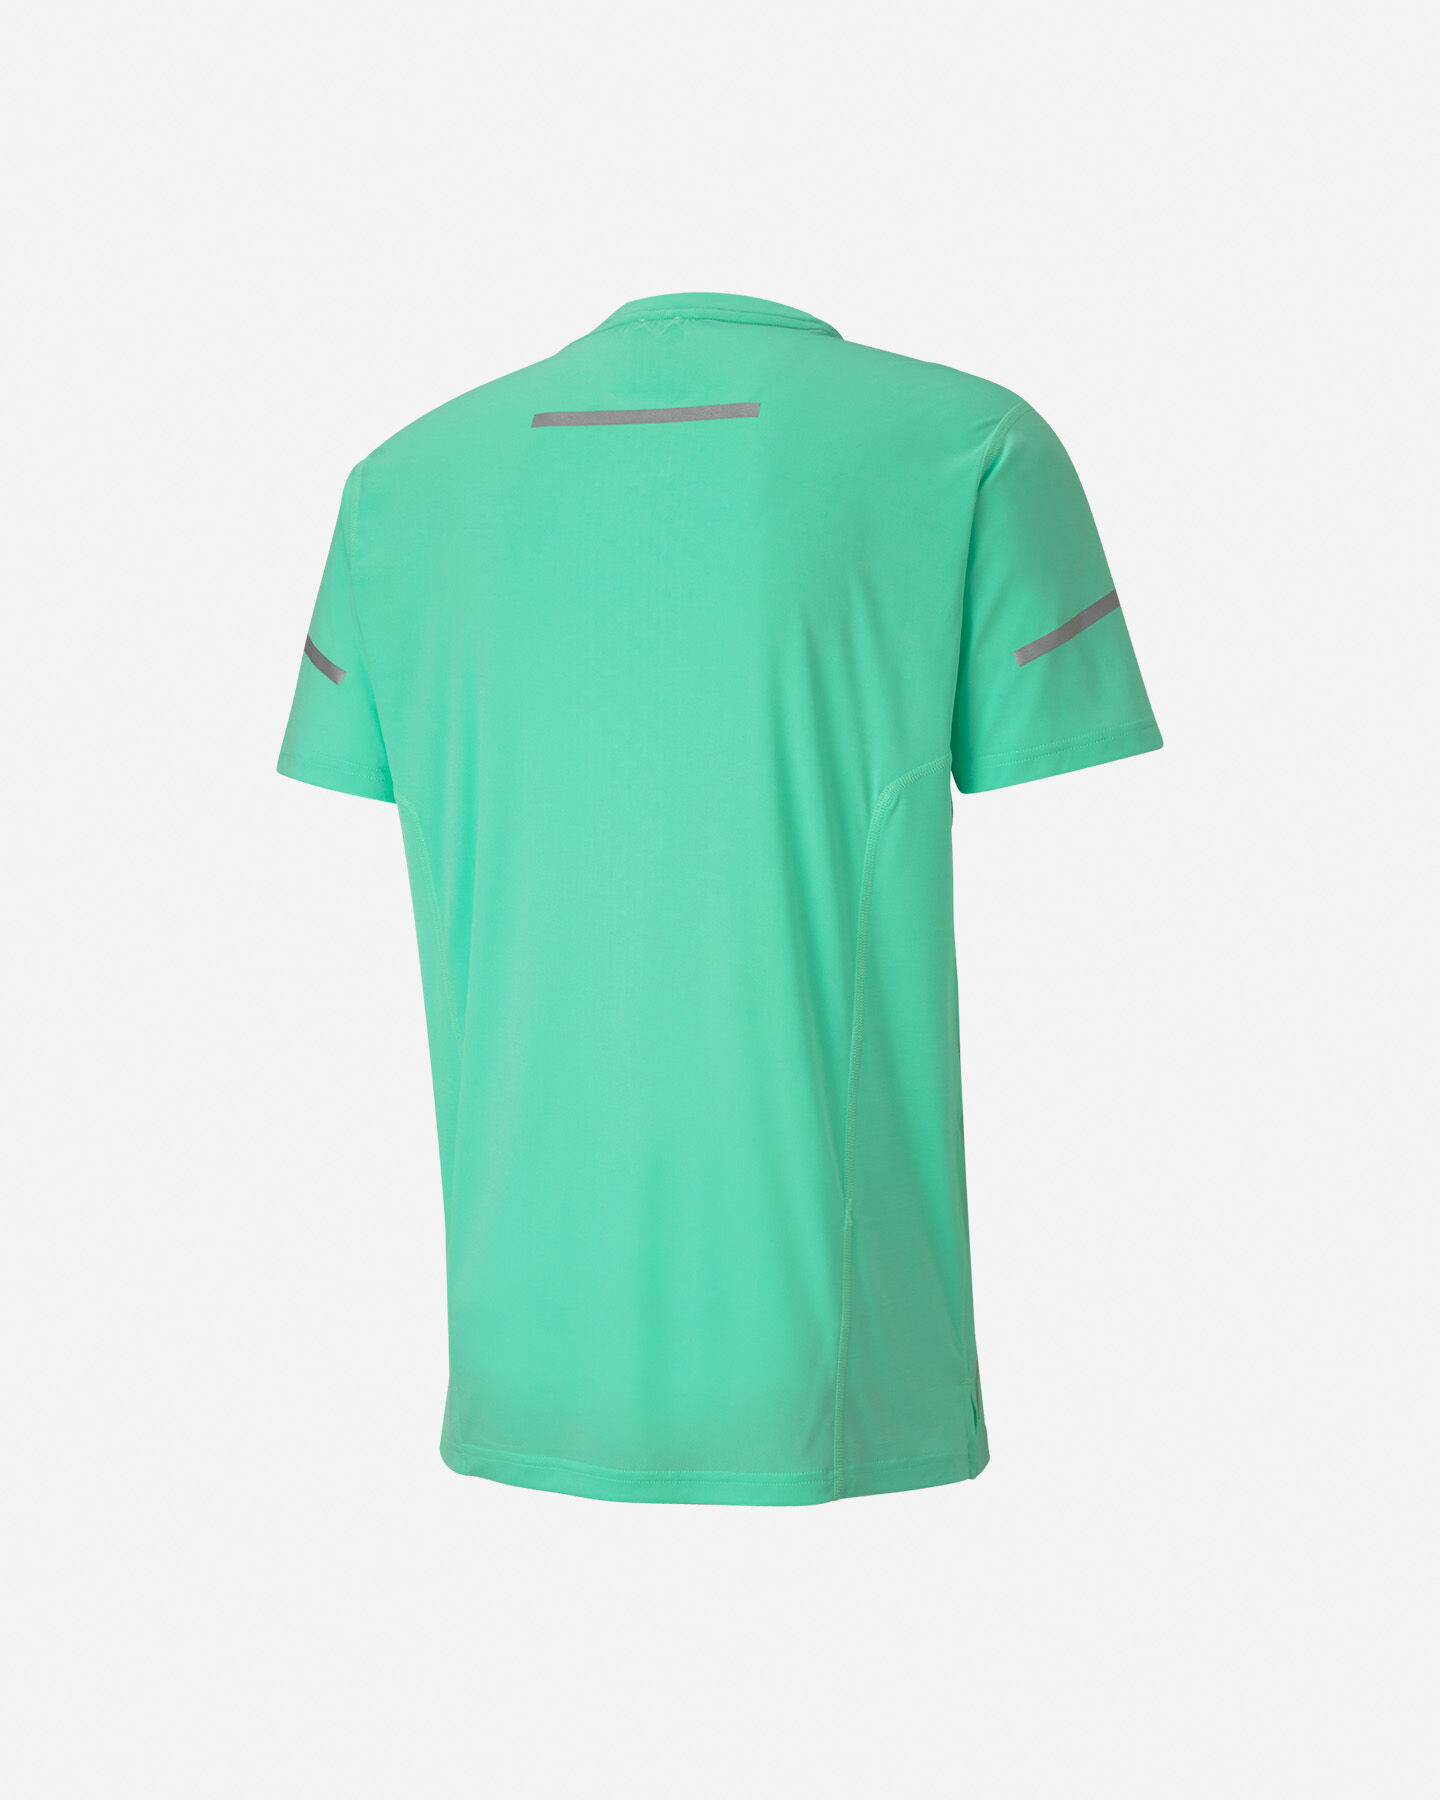 T-Shirt running PUMA BIO MOTION THERMO M S5189108 scatto 1